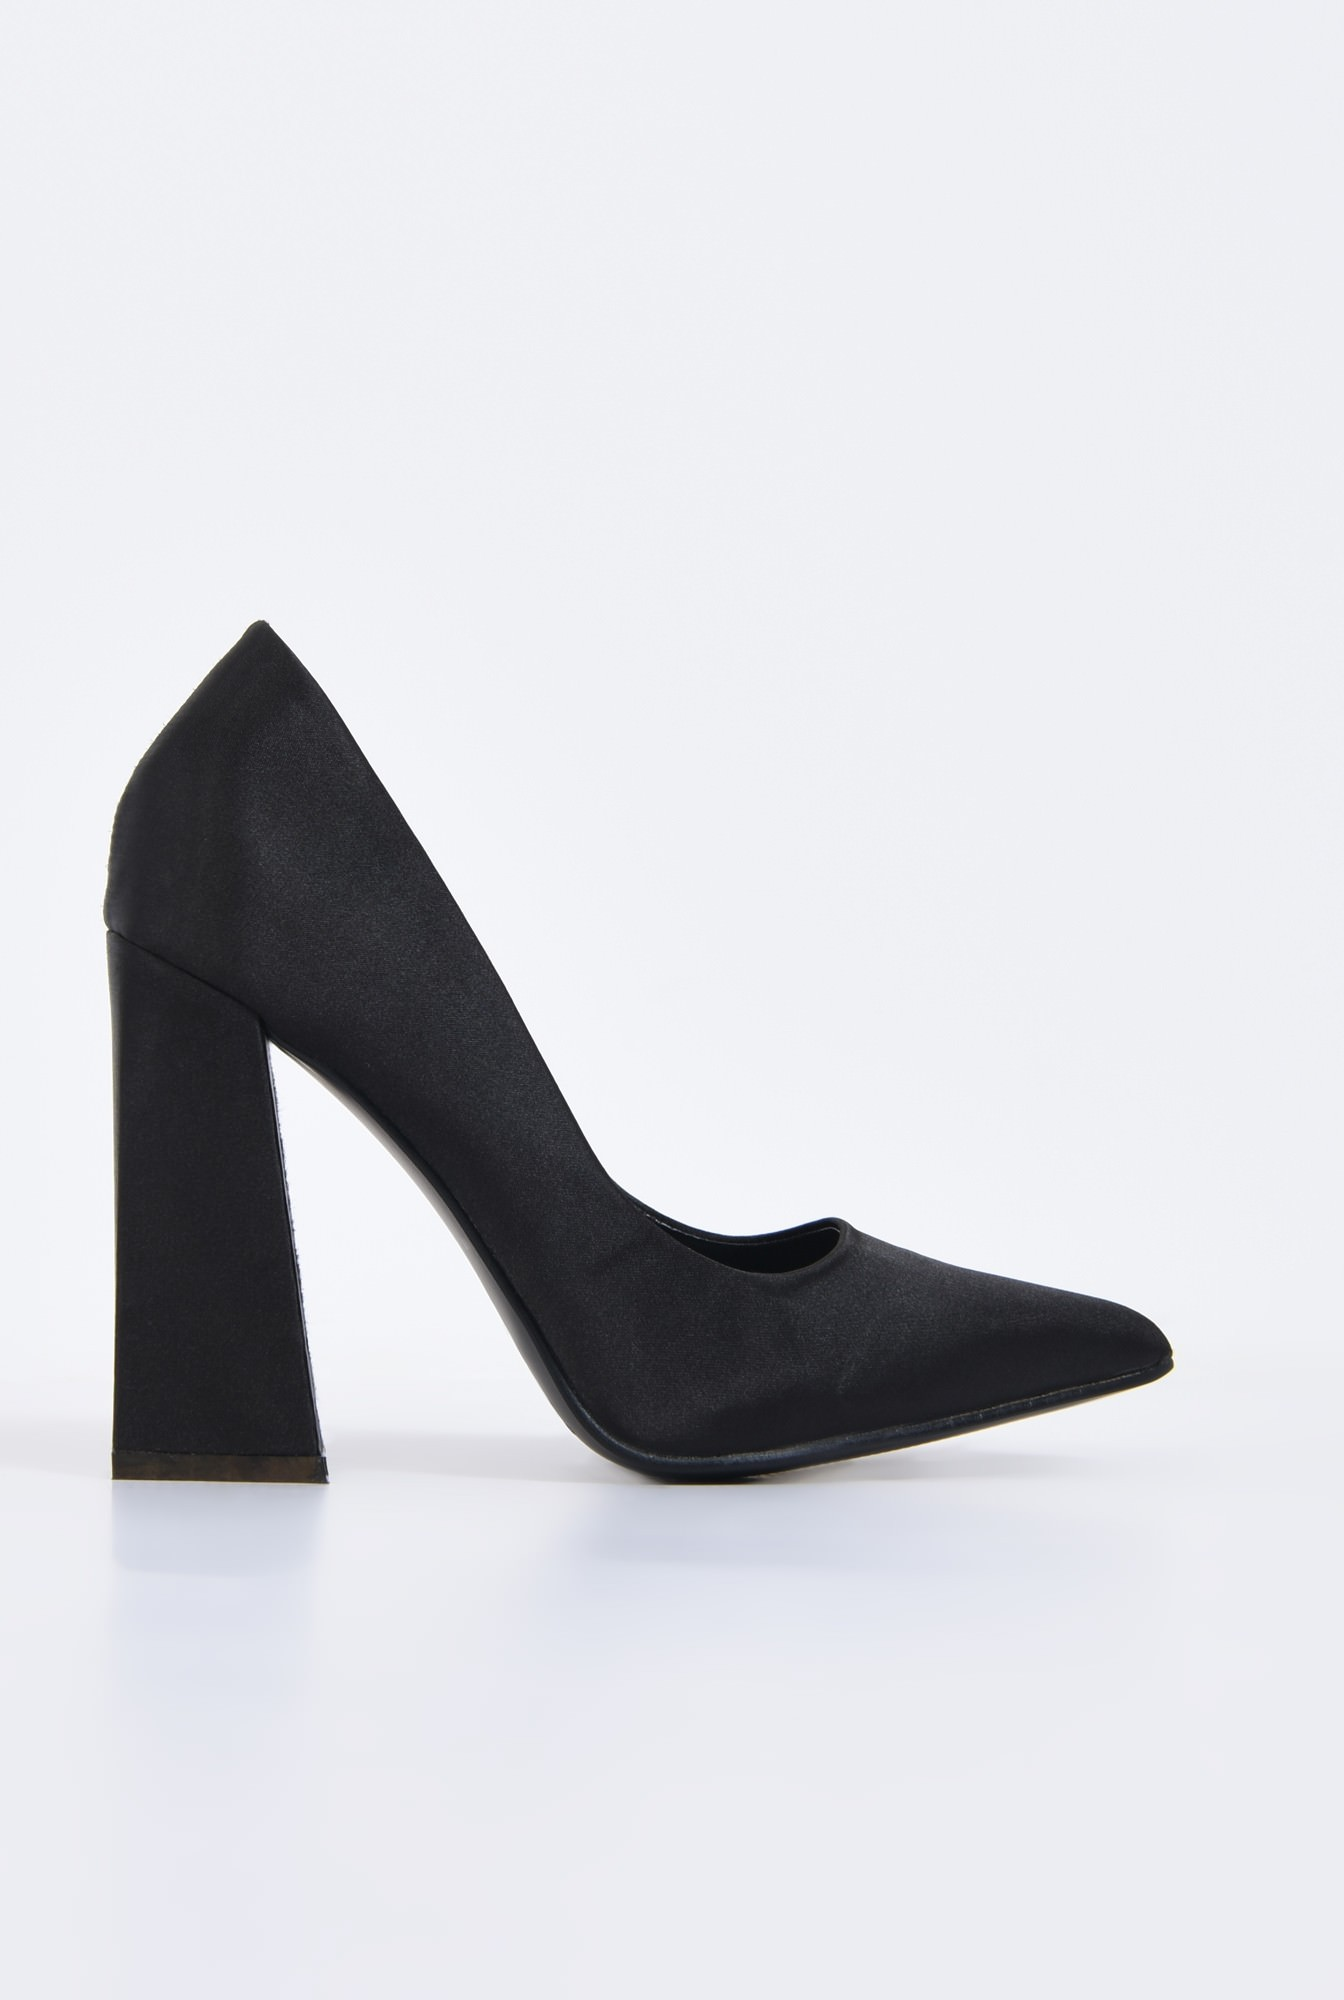 pantofi eleganti, negri, satin, toc inalt